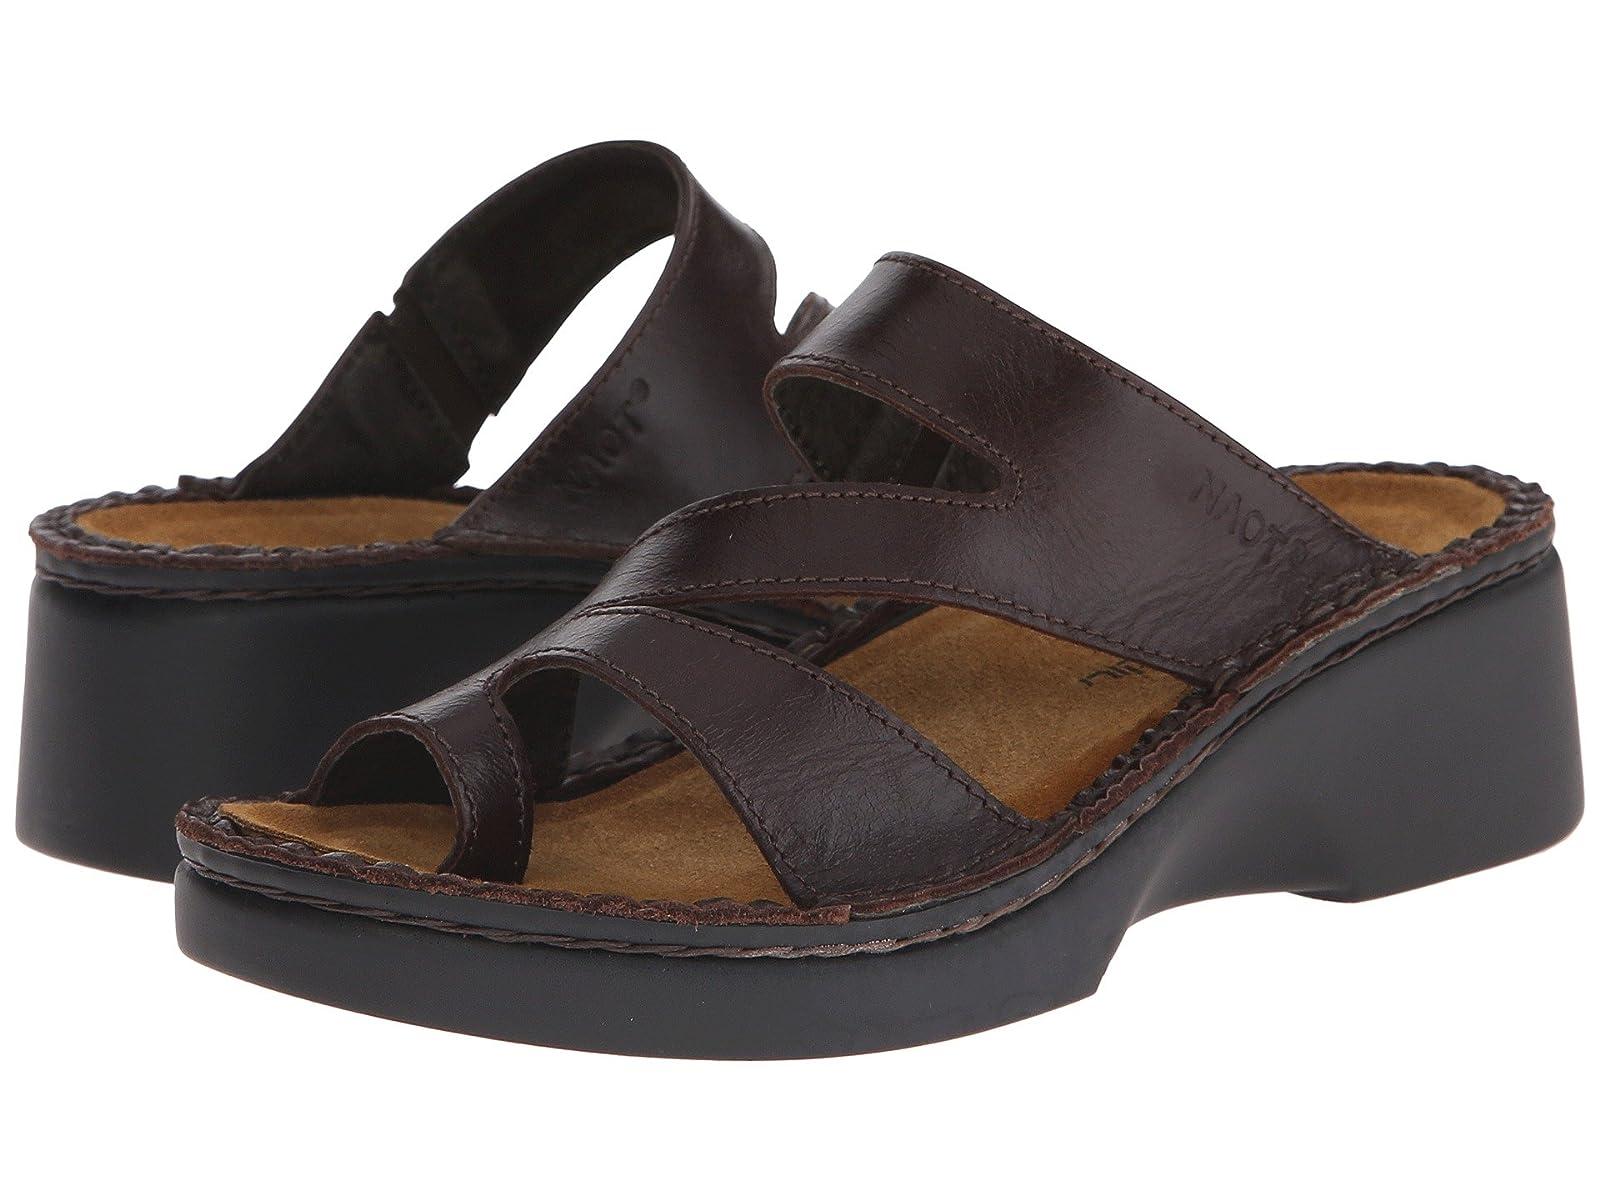 Naot MontereyAtmospheric grades have affordable shoes